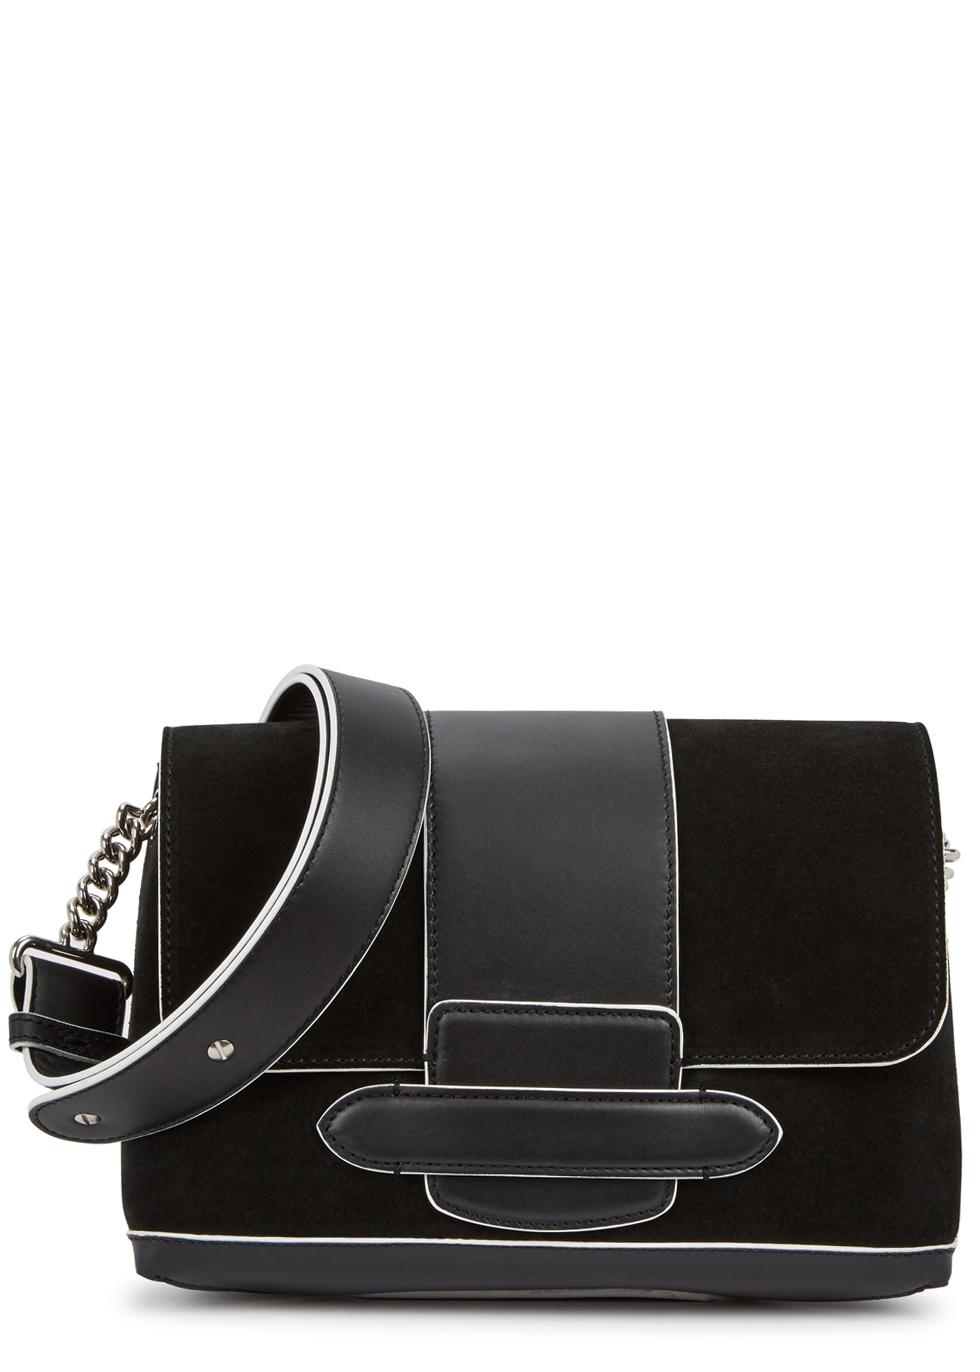 MICHINO PARIS Phedra Monochrome Suede Shoulder Bag in Black